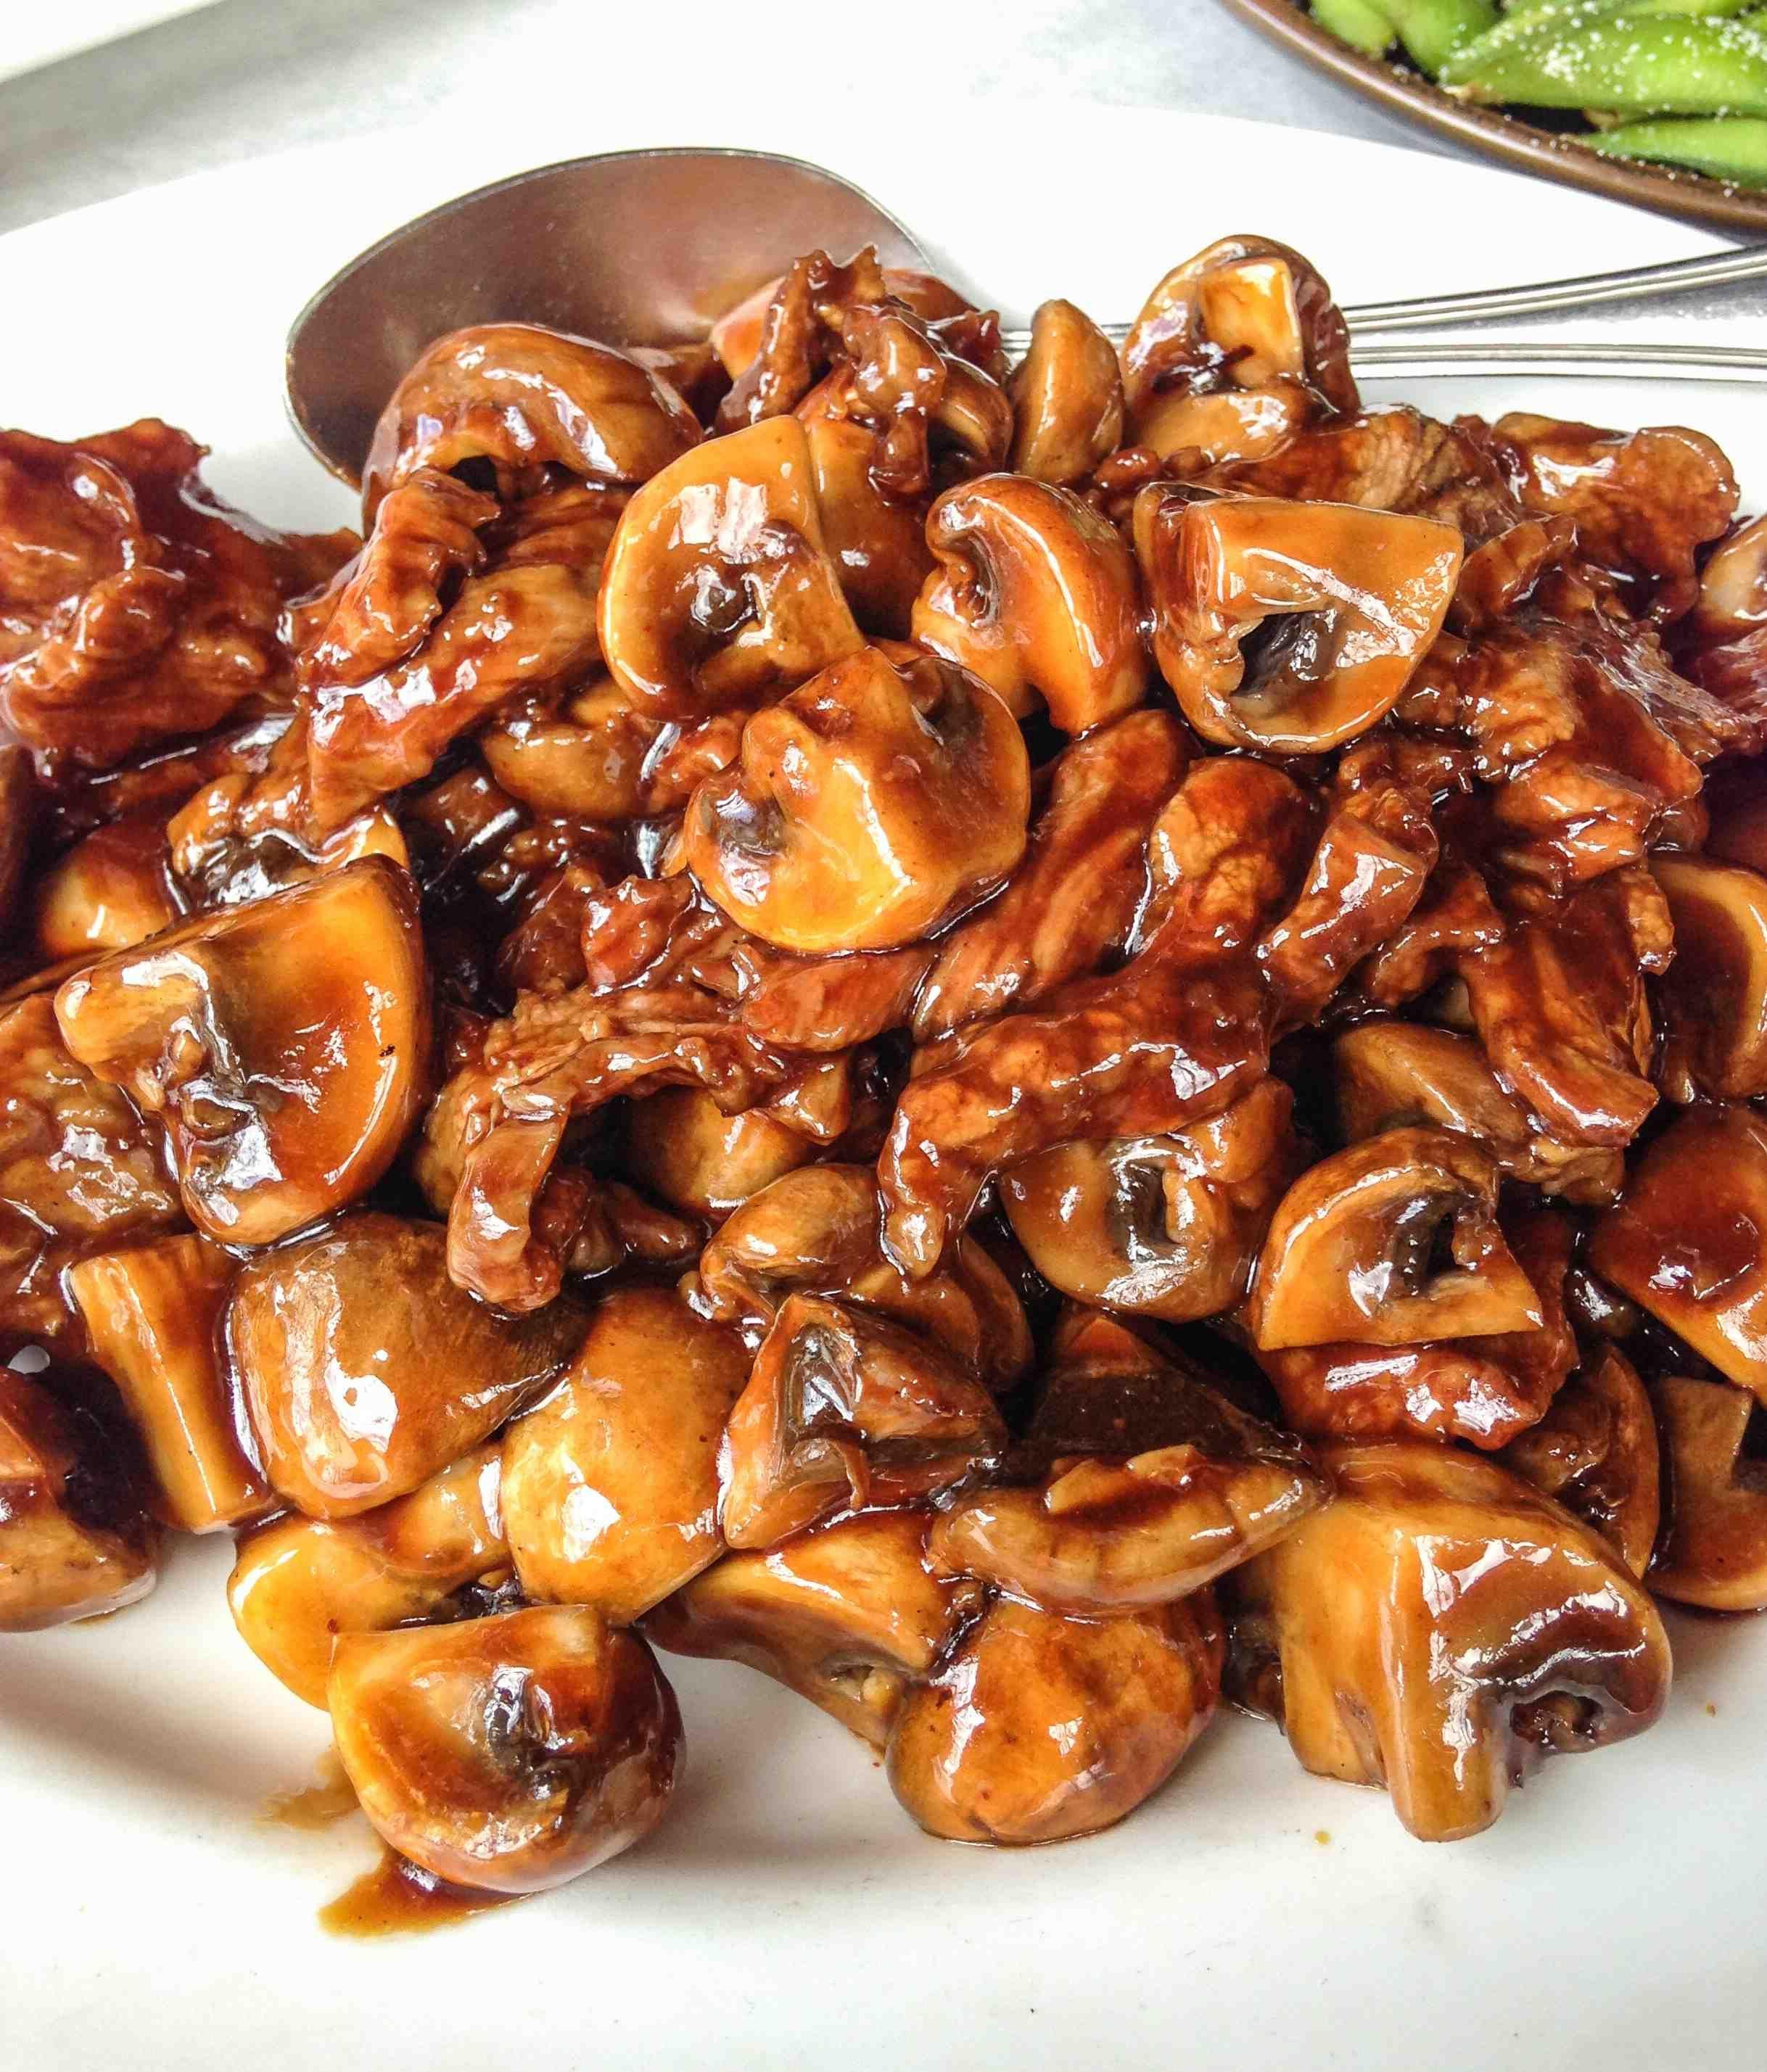 Teriyaki Beef With Mushrooms Delicious Beef Recipe Beef With Mushroom Beef Recipes